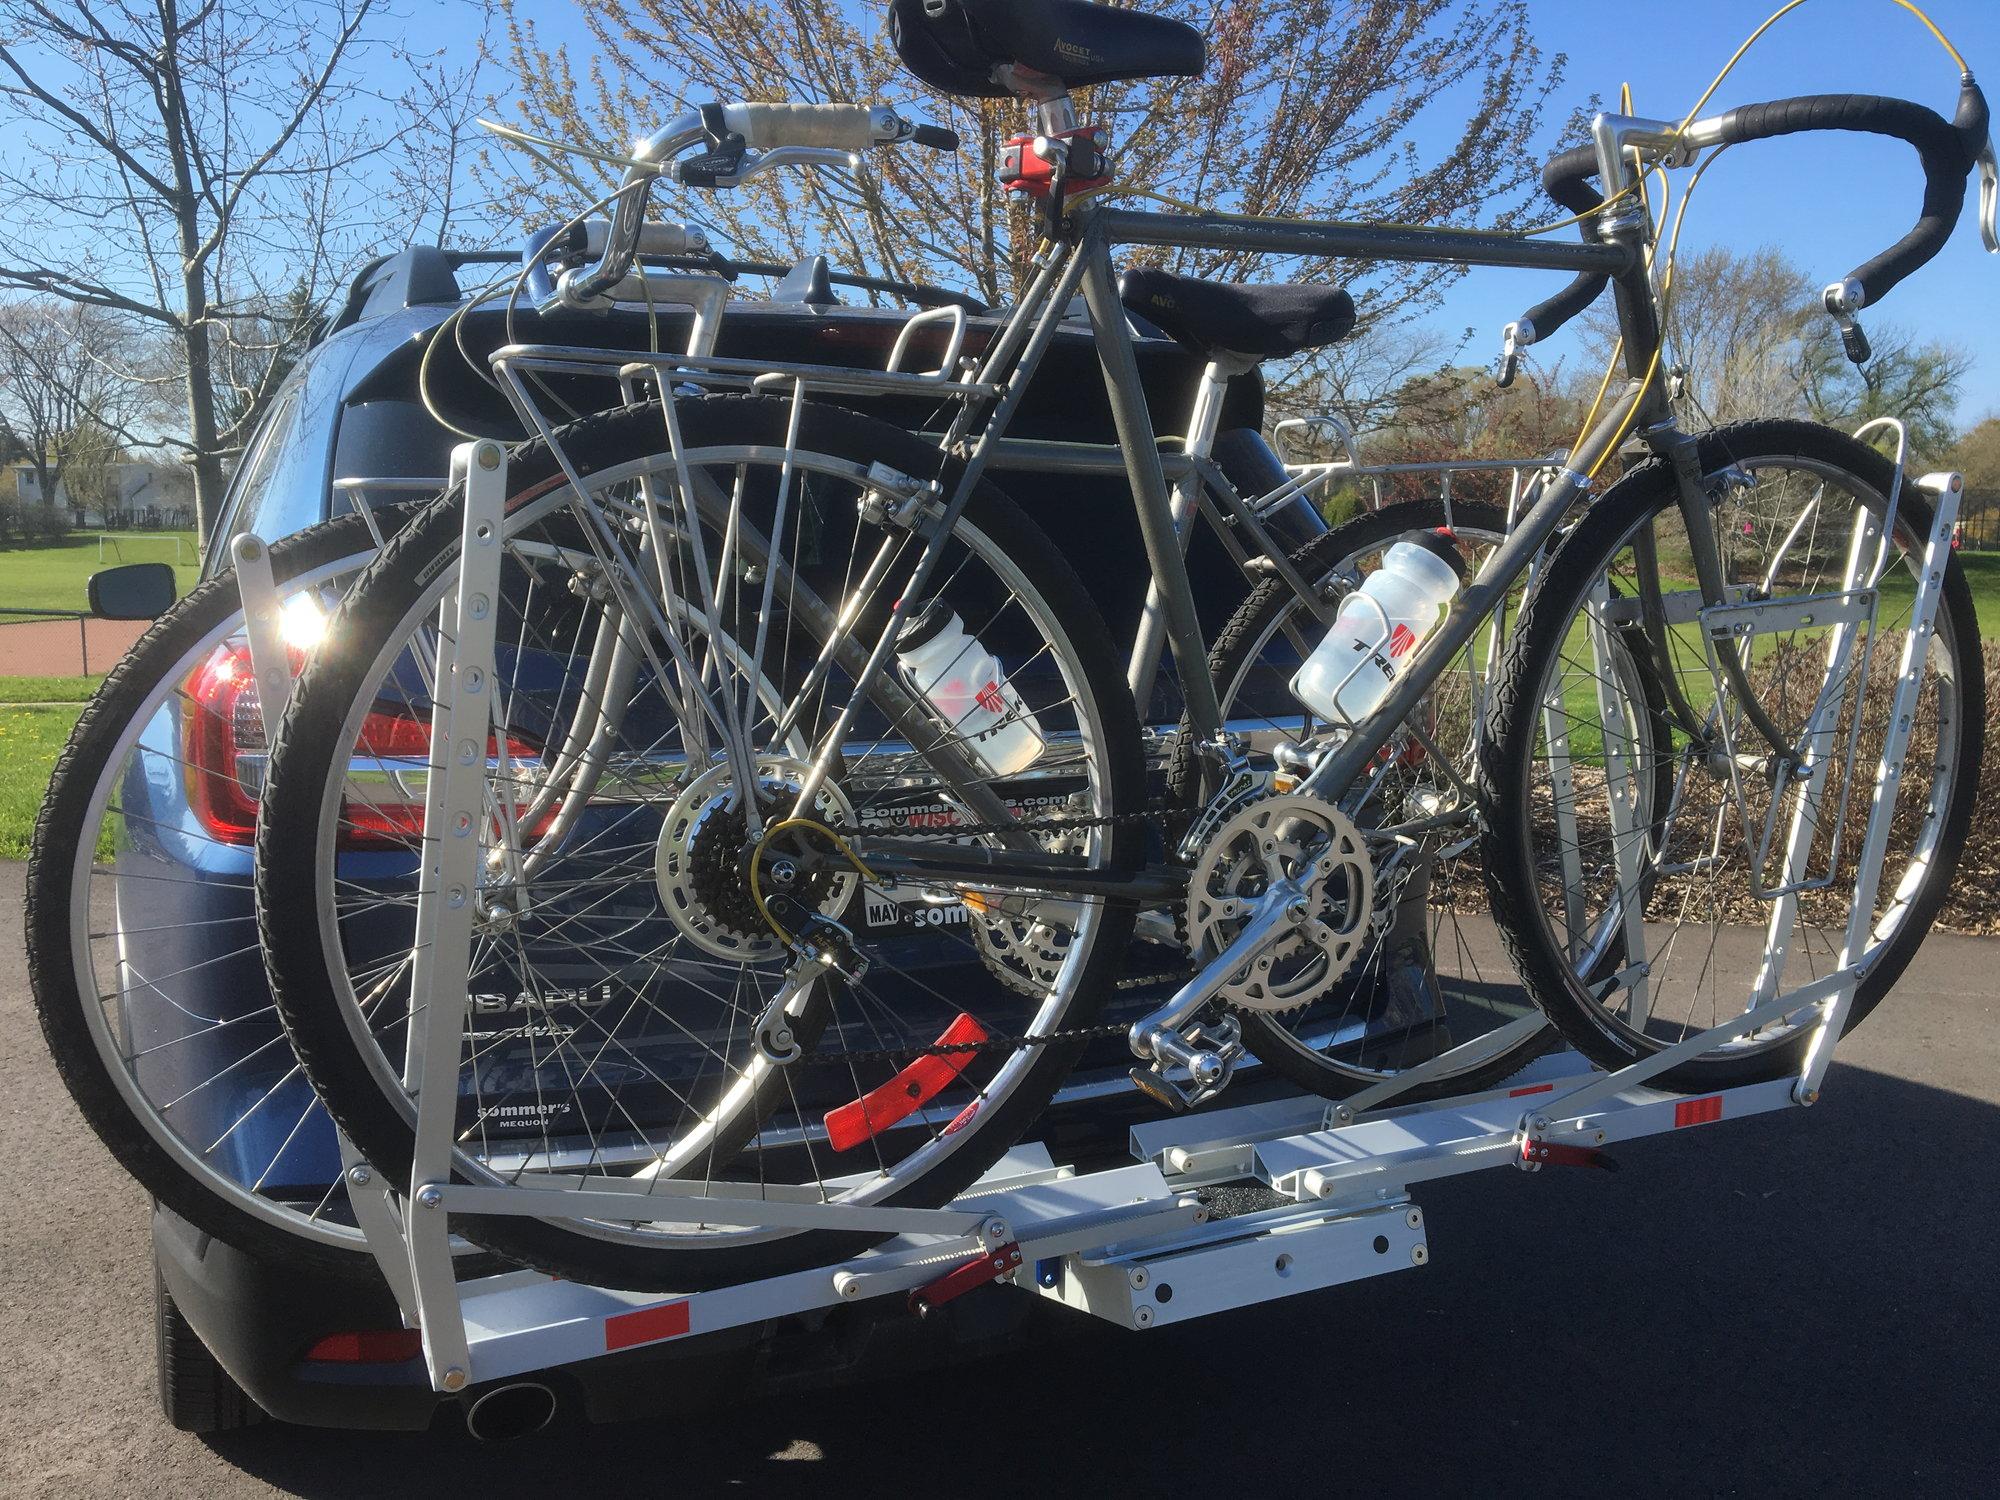 thumbs up for 1up usa bike rack bike